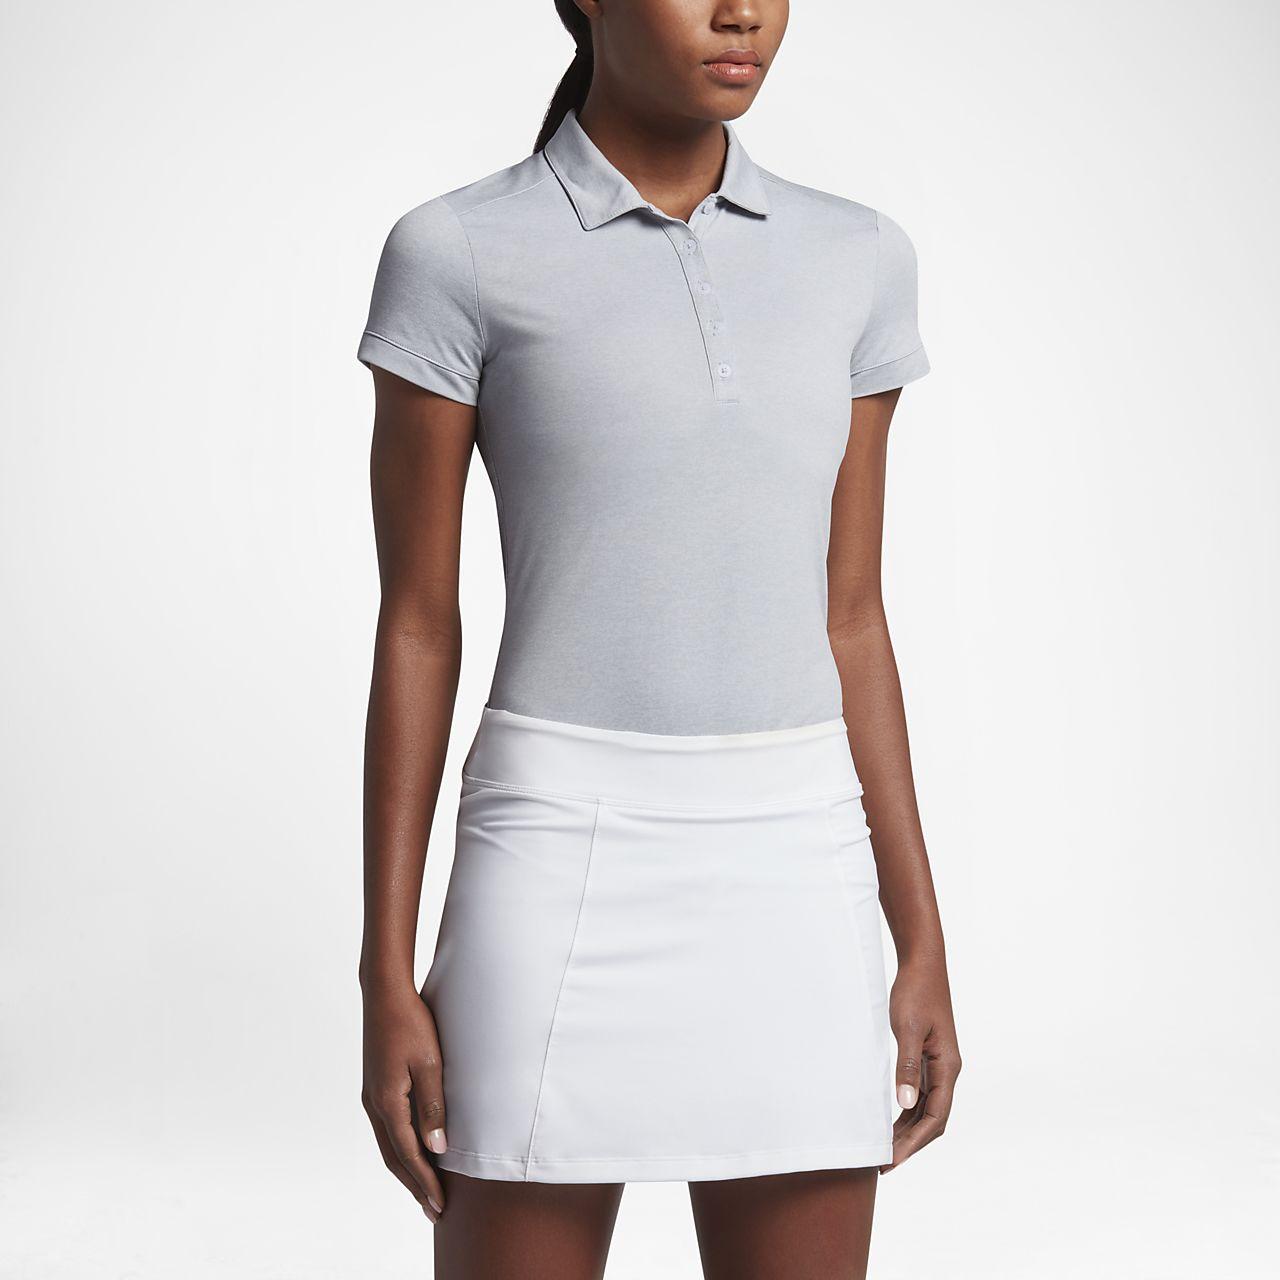 Nike womens golf shirts xxl